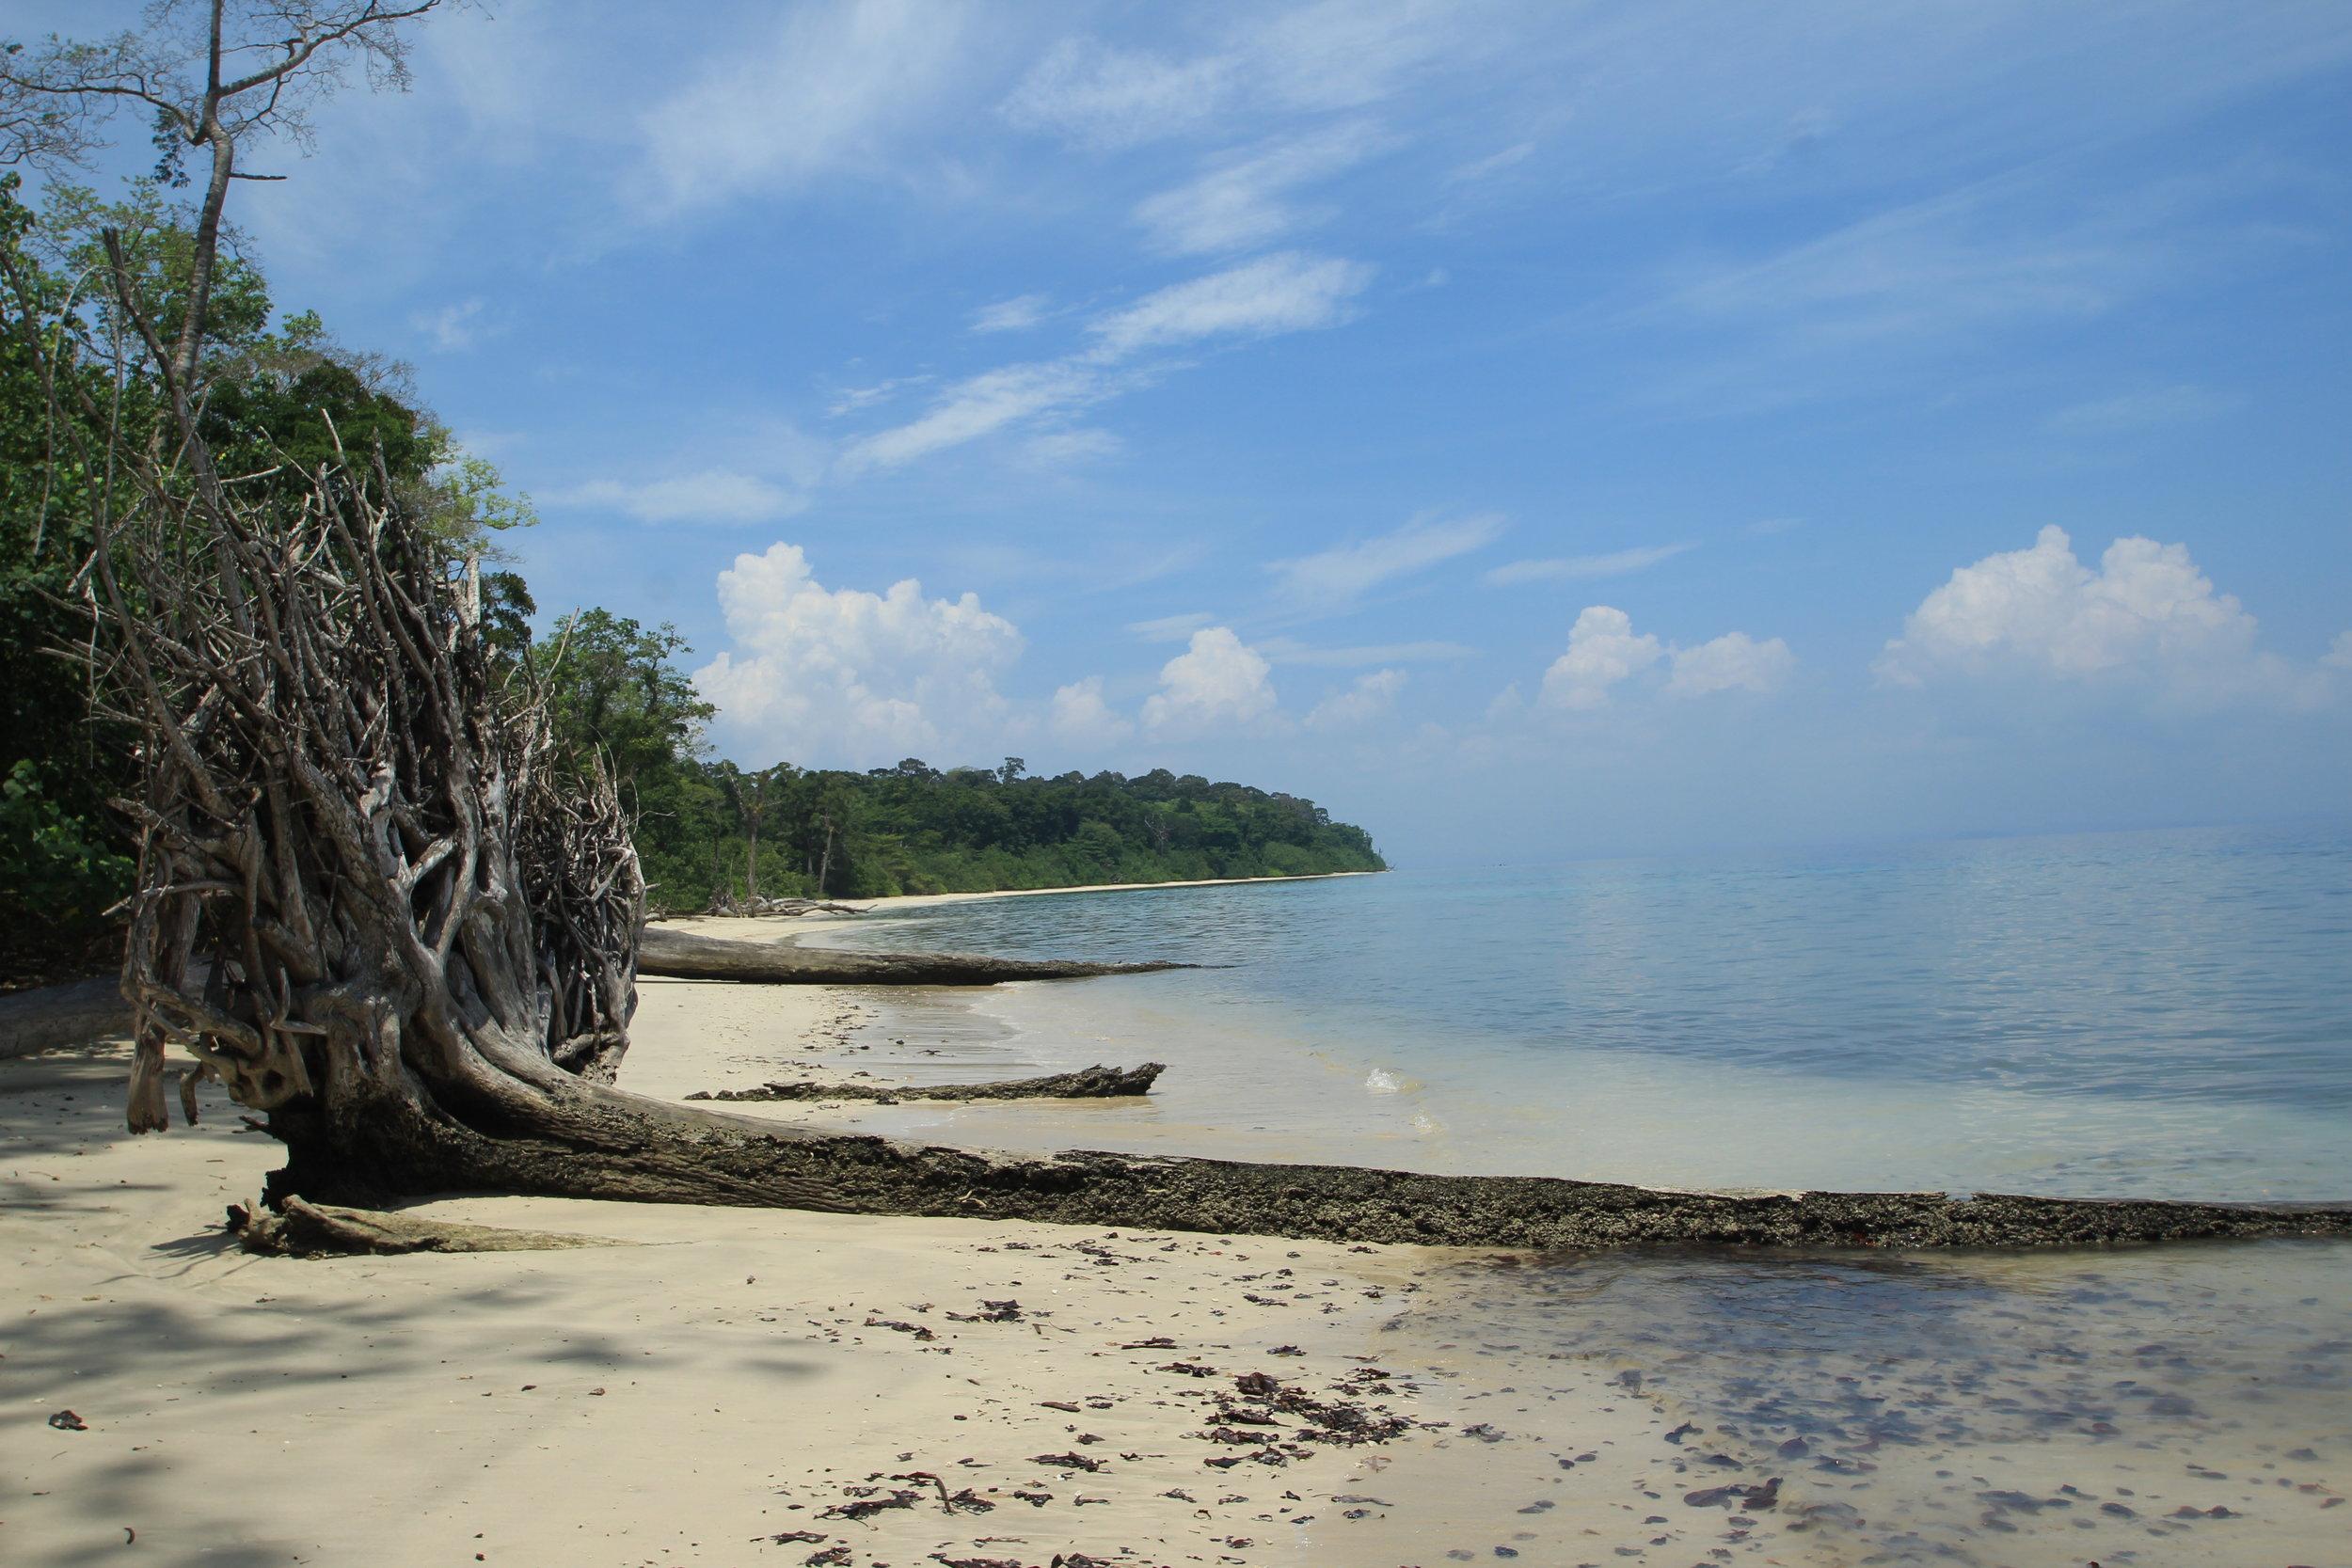 Fallen shoreline trees